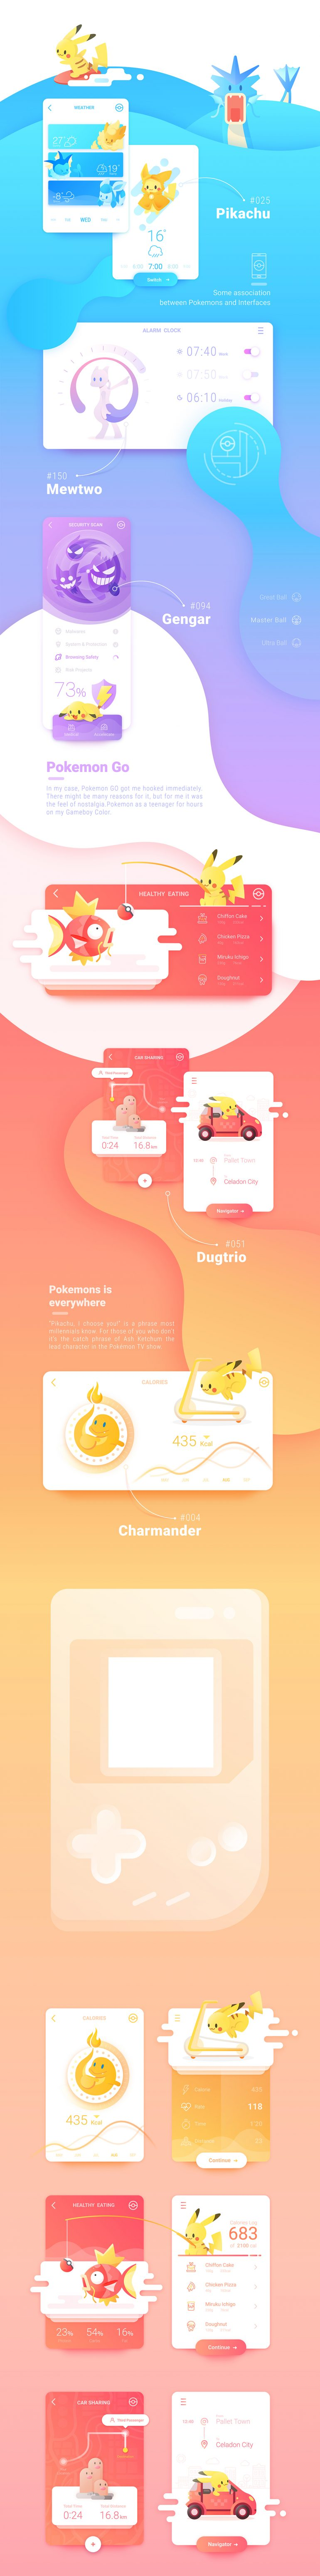 Animated scroll of Pokemon by Daz_Qu